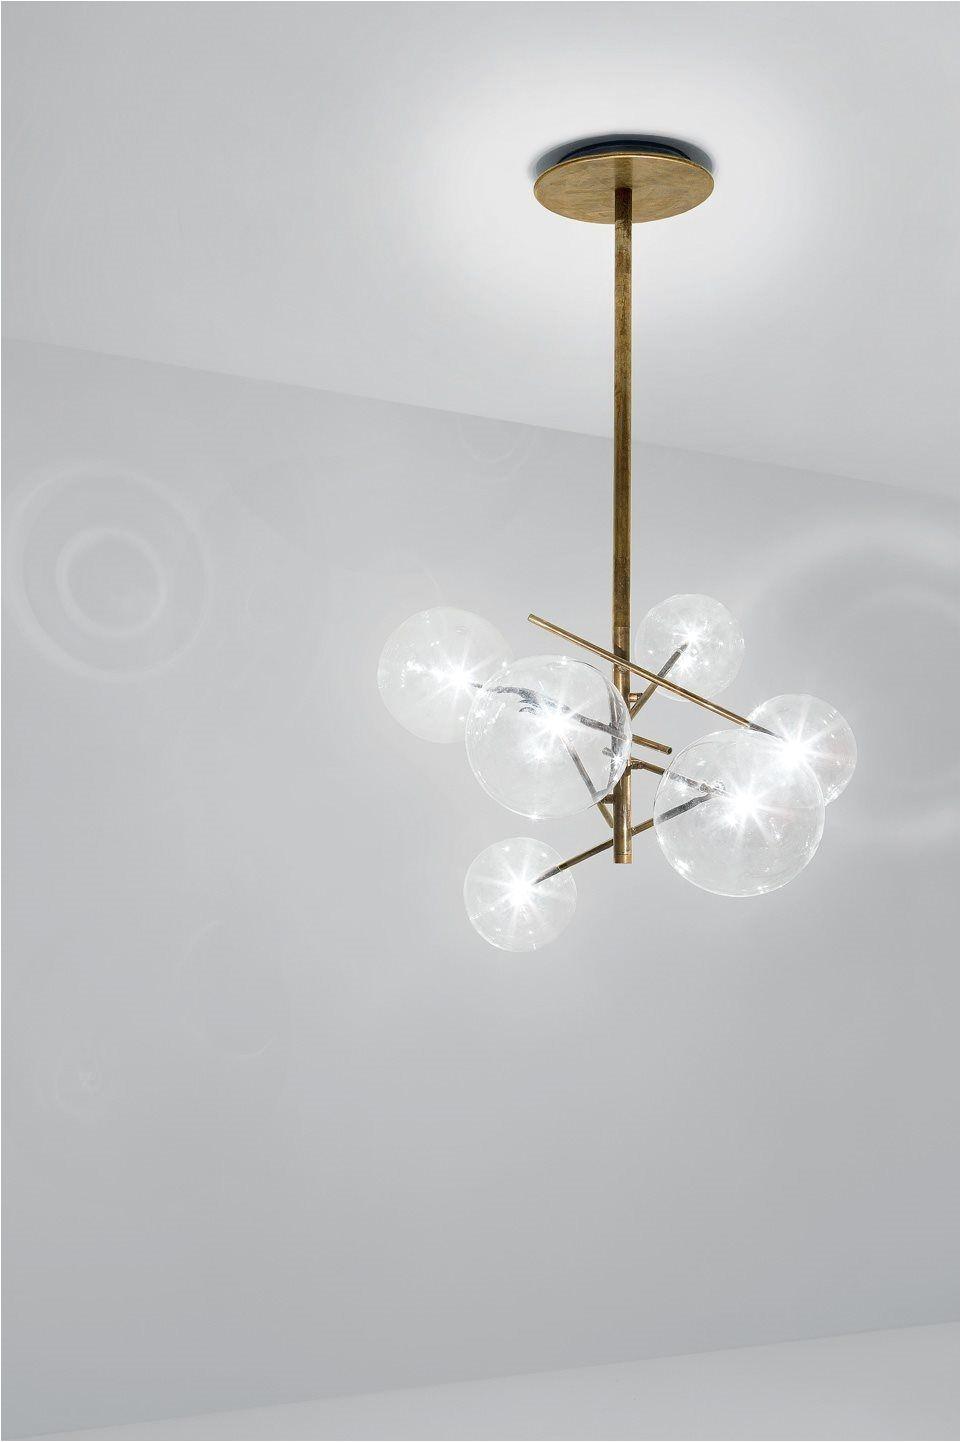 Wireless Overhead Light Bolle Ceiling Light by Gallotti and Radice Via Designresource Co